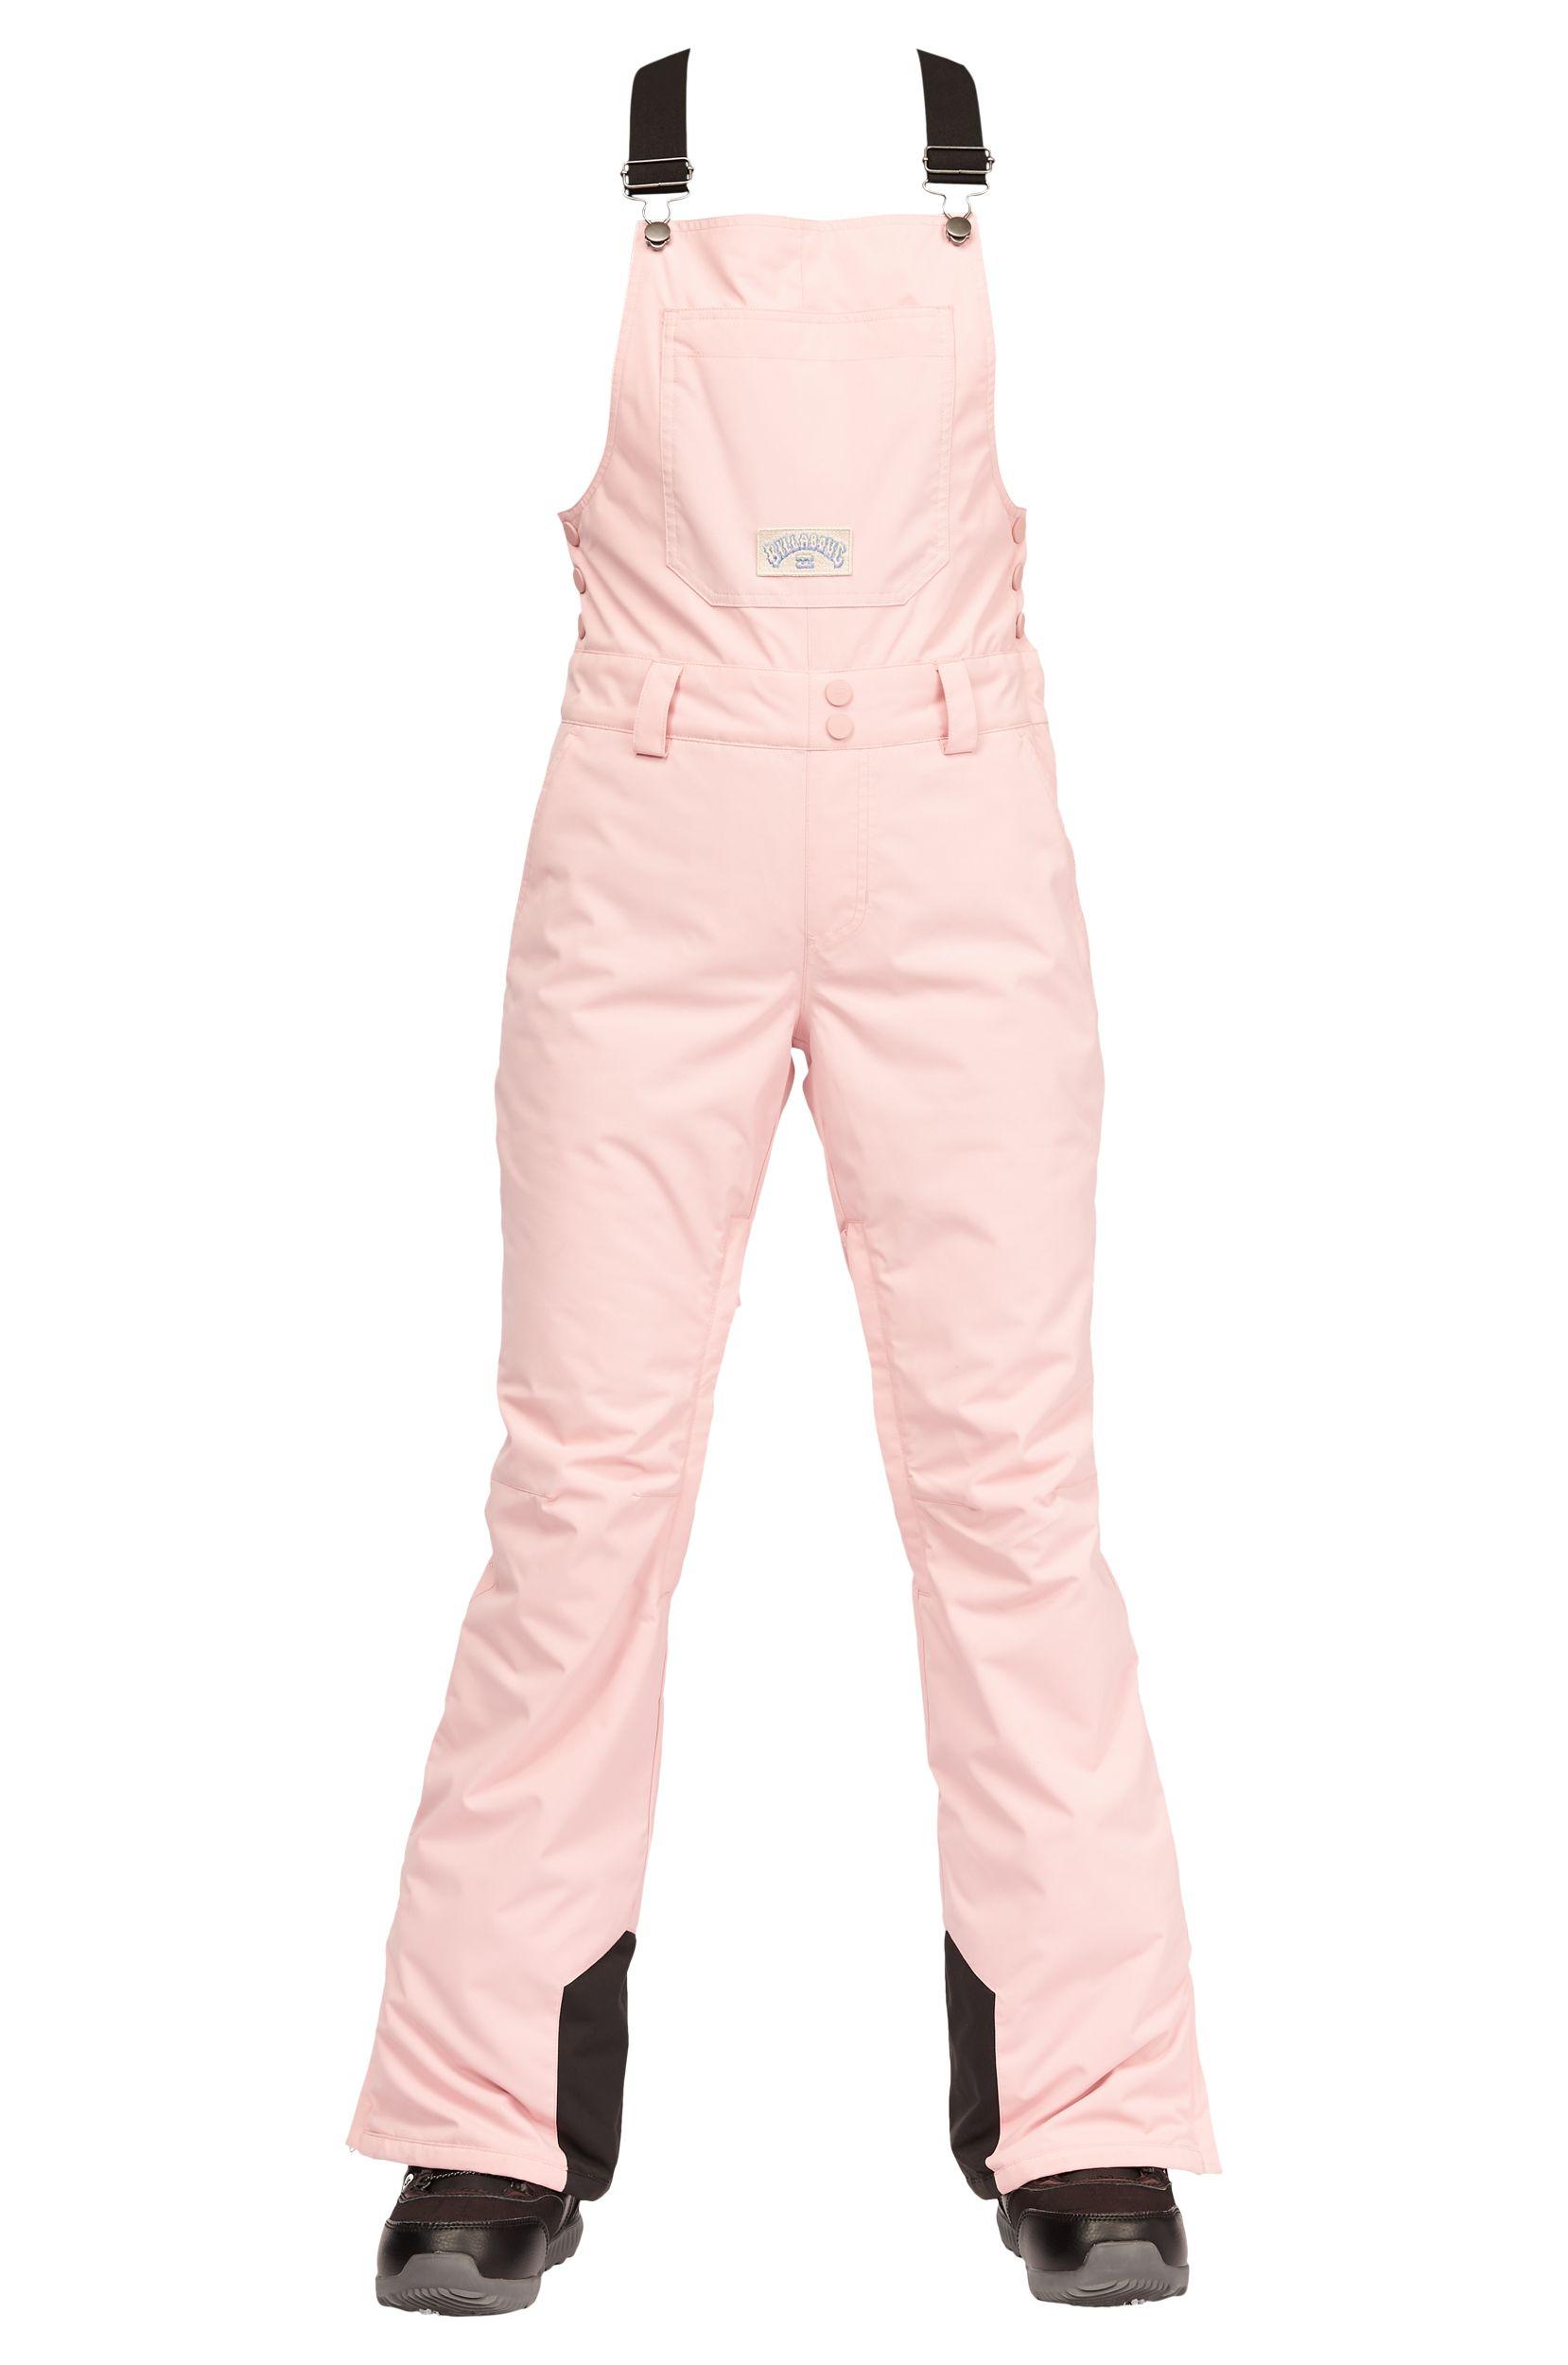 Calças Billabong RIVA BIB Ice Pink